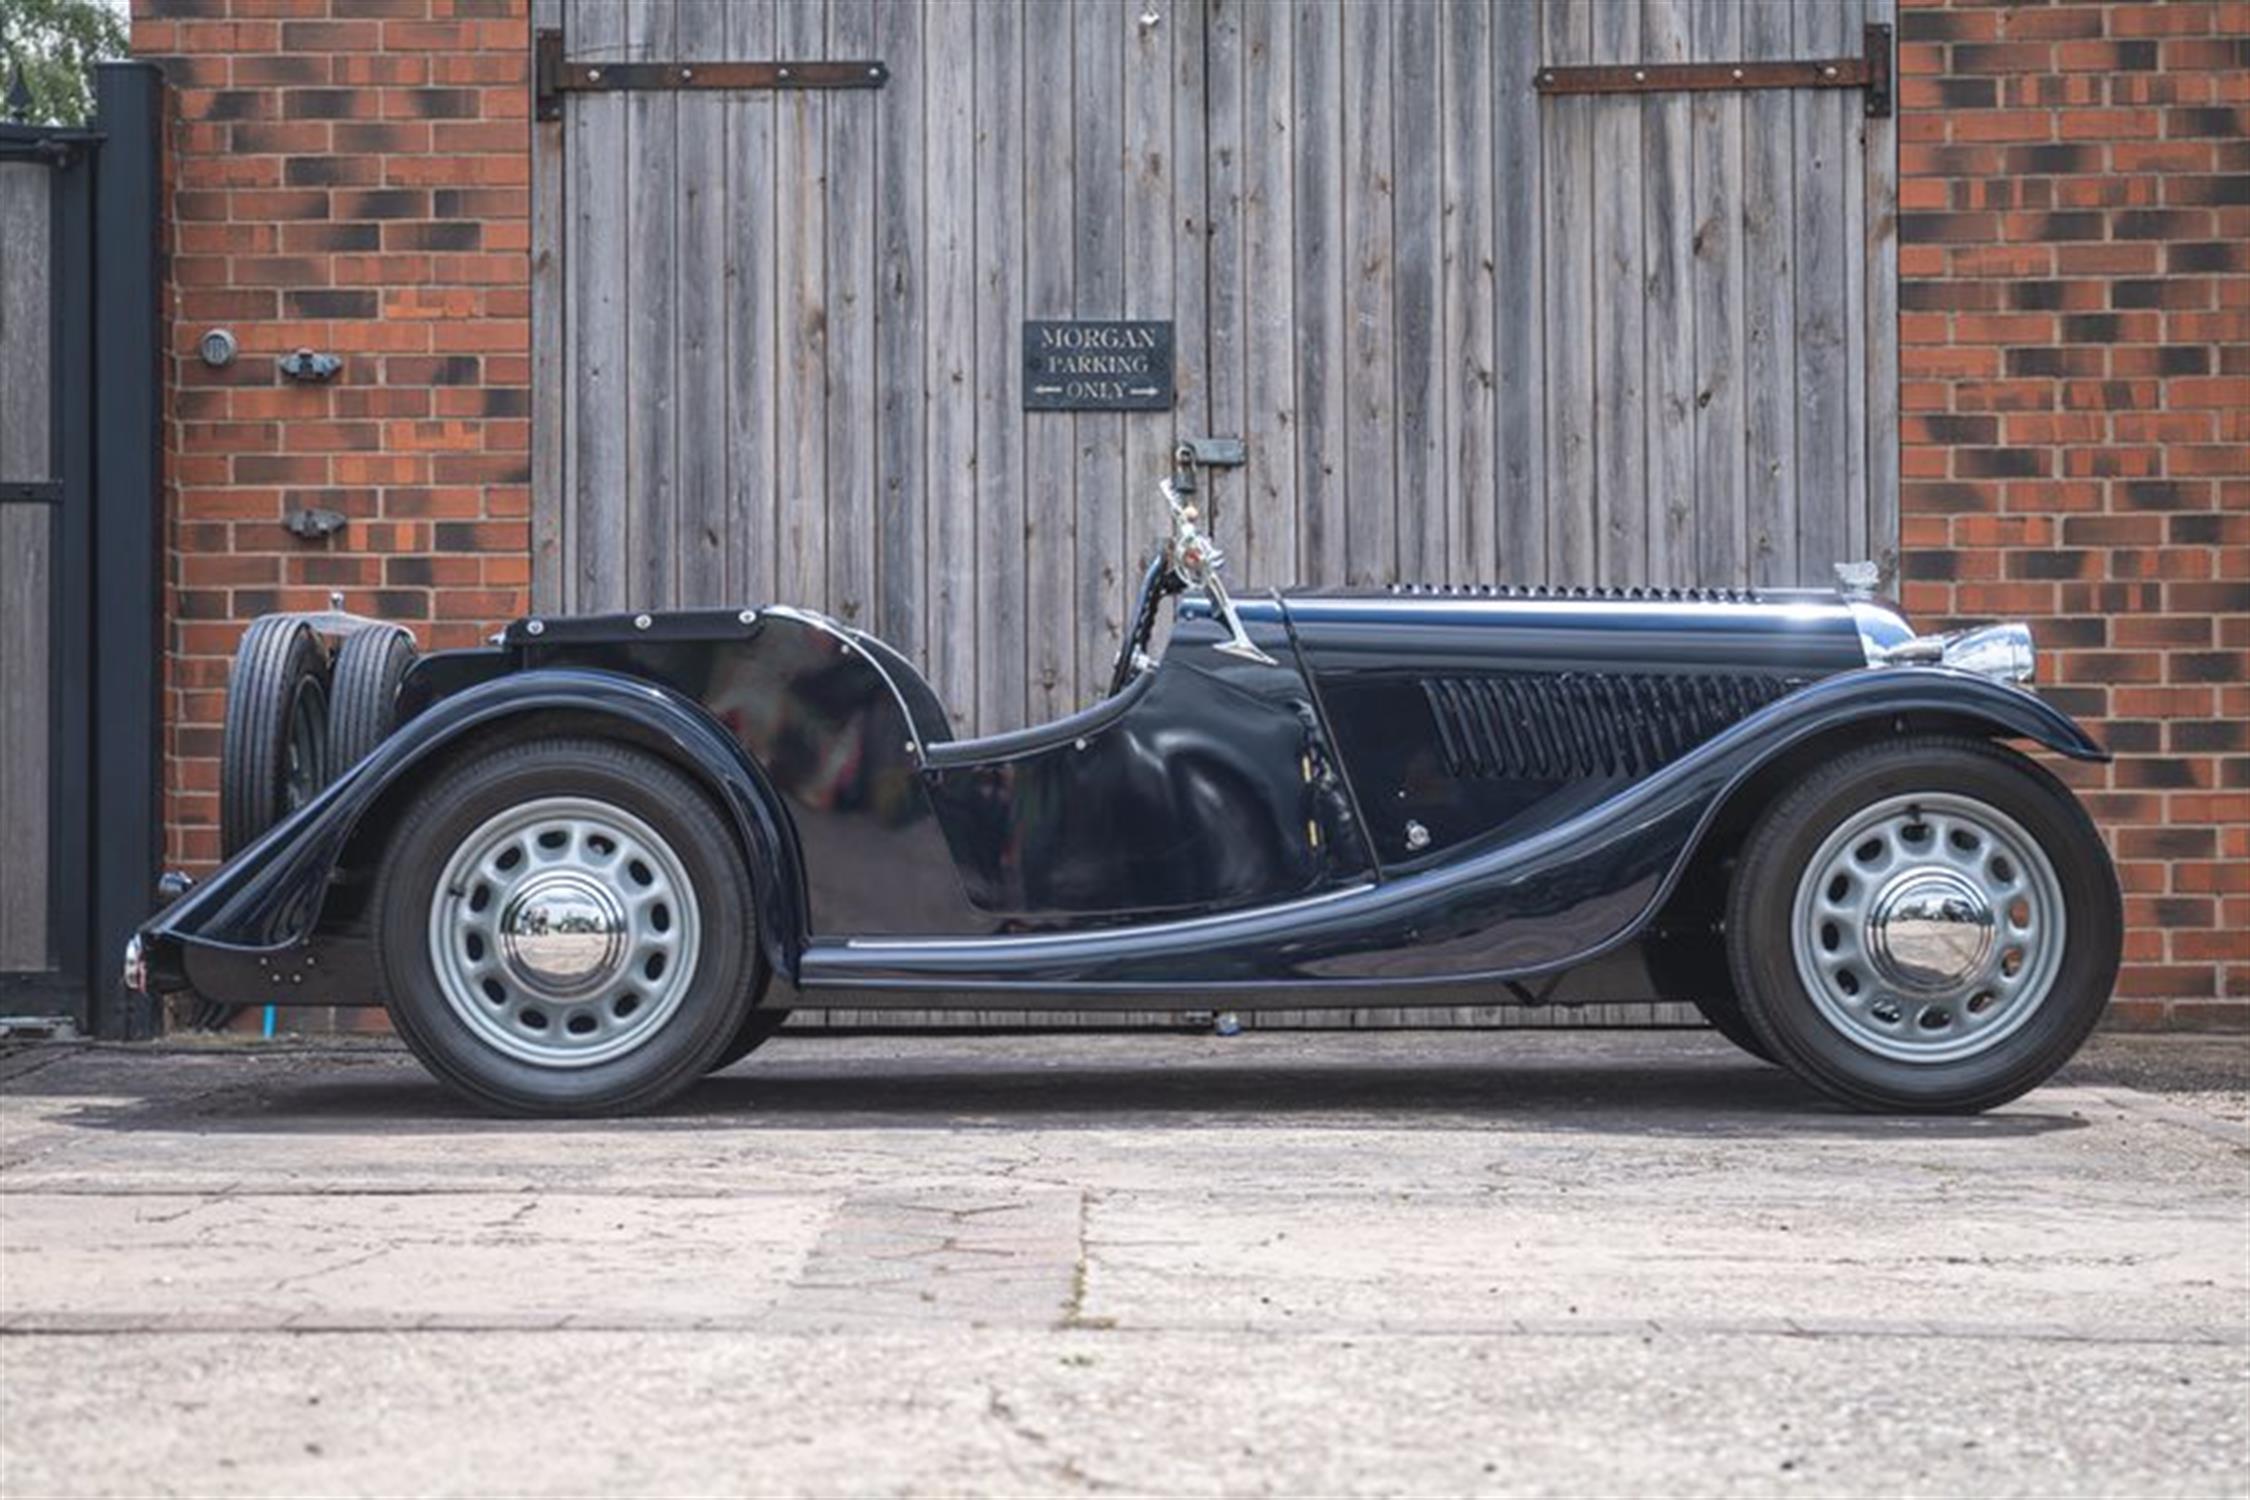 1939 Morgan 4/4 Series 1 'Flat Rad' (1098cc Climax Engine) - Image 7 of 10